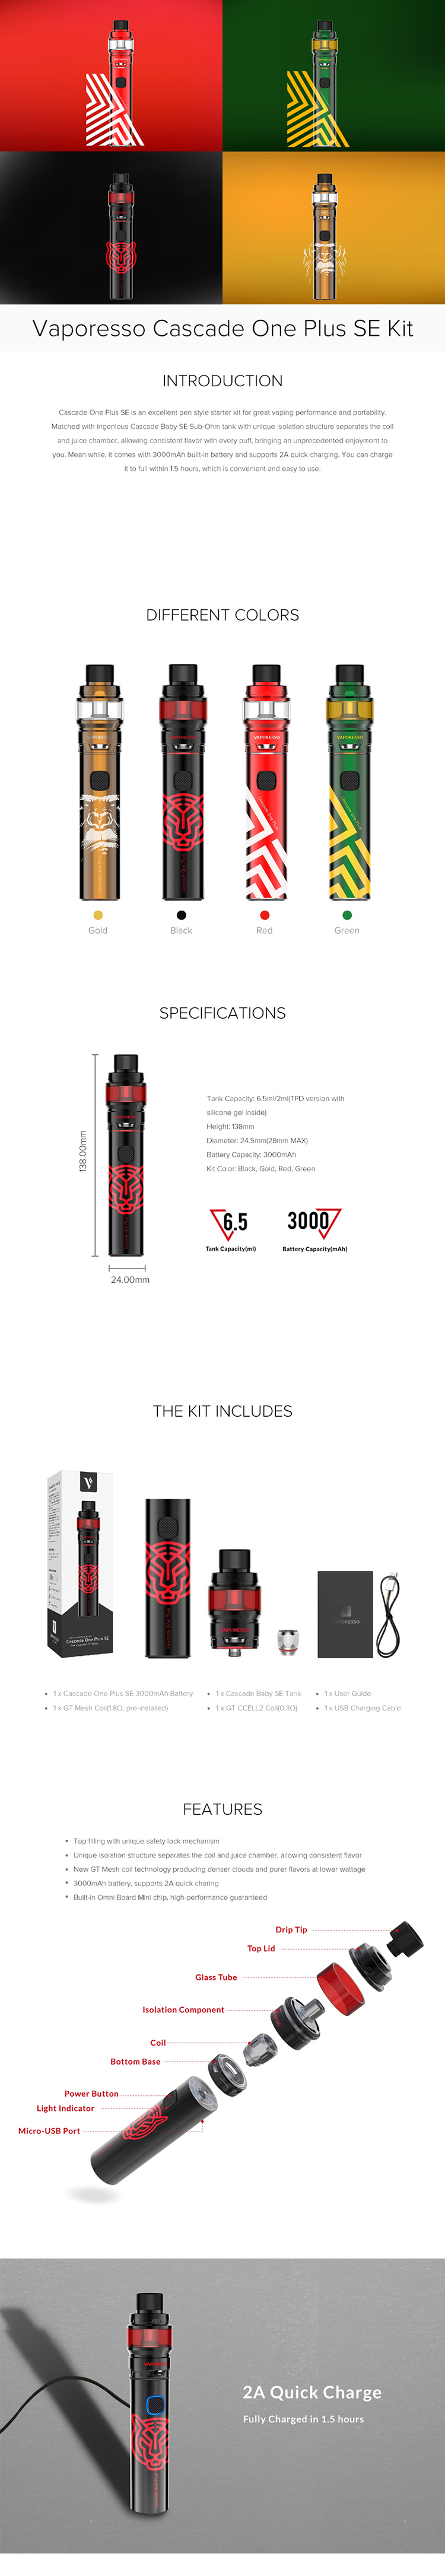 Vaporesso Cascade One Plus SE Kit